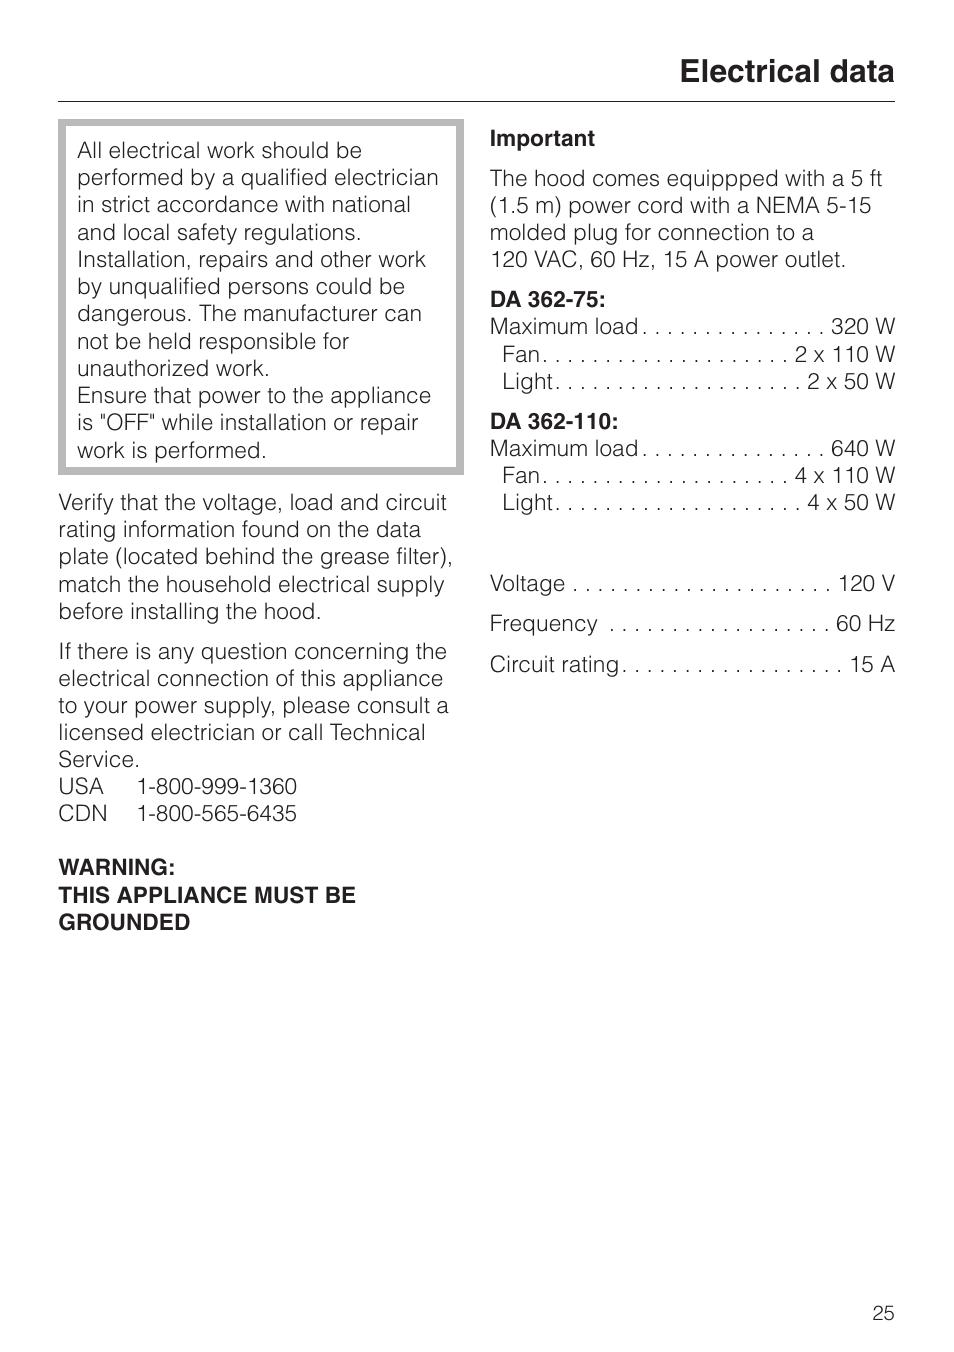 electrical data 25 electrical data miele da 362 75 user manual rh manualsdir com Repair Manuals Service Station